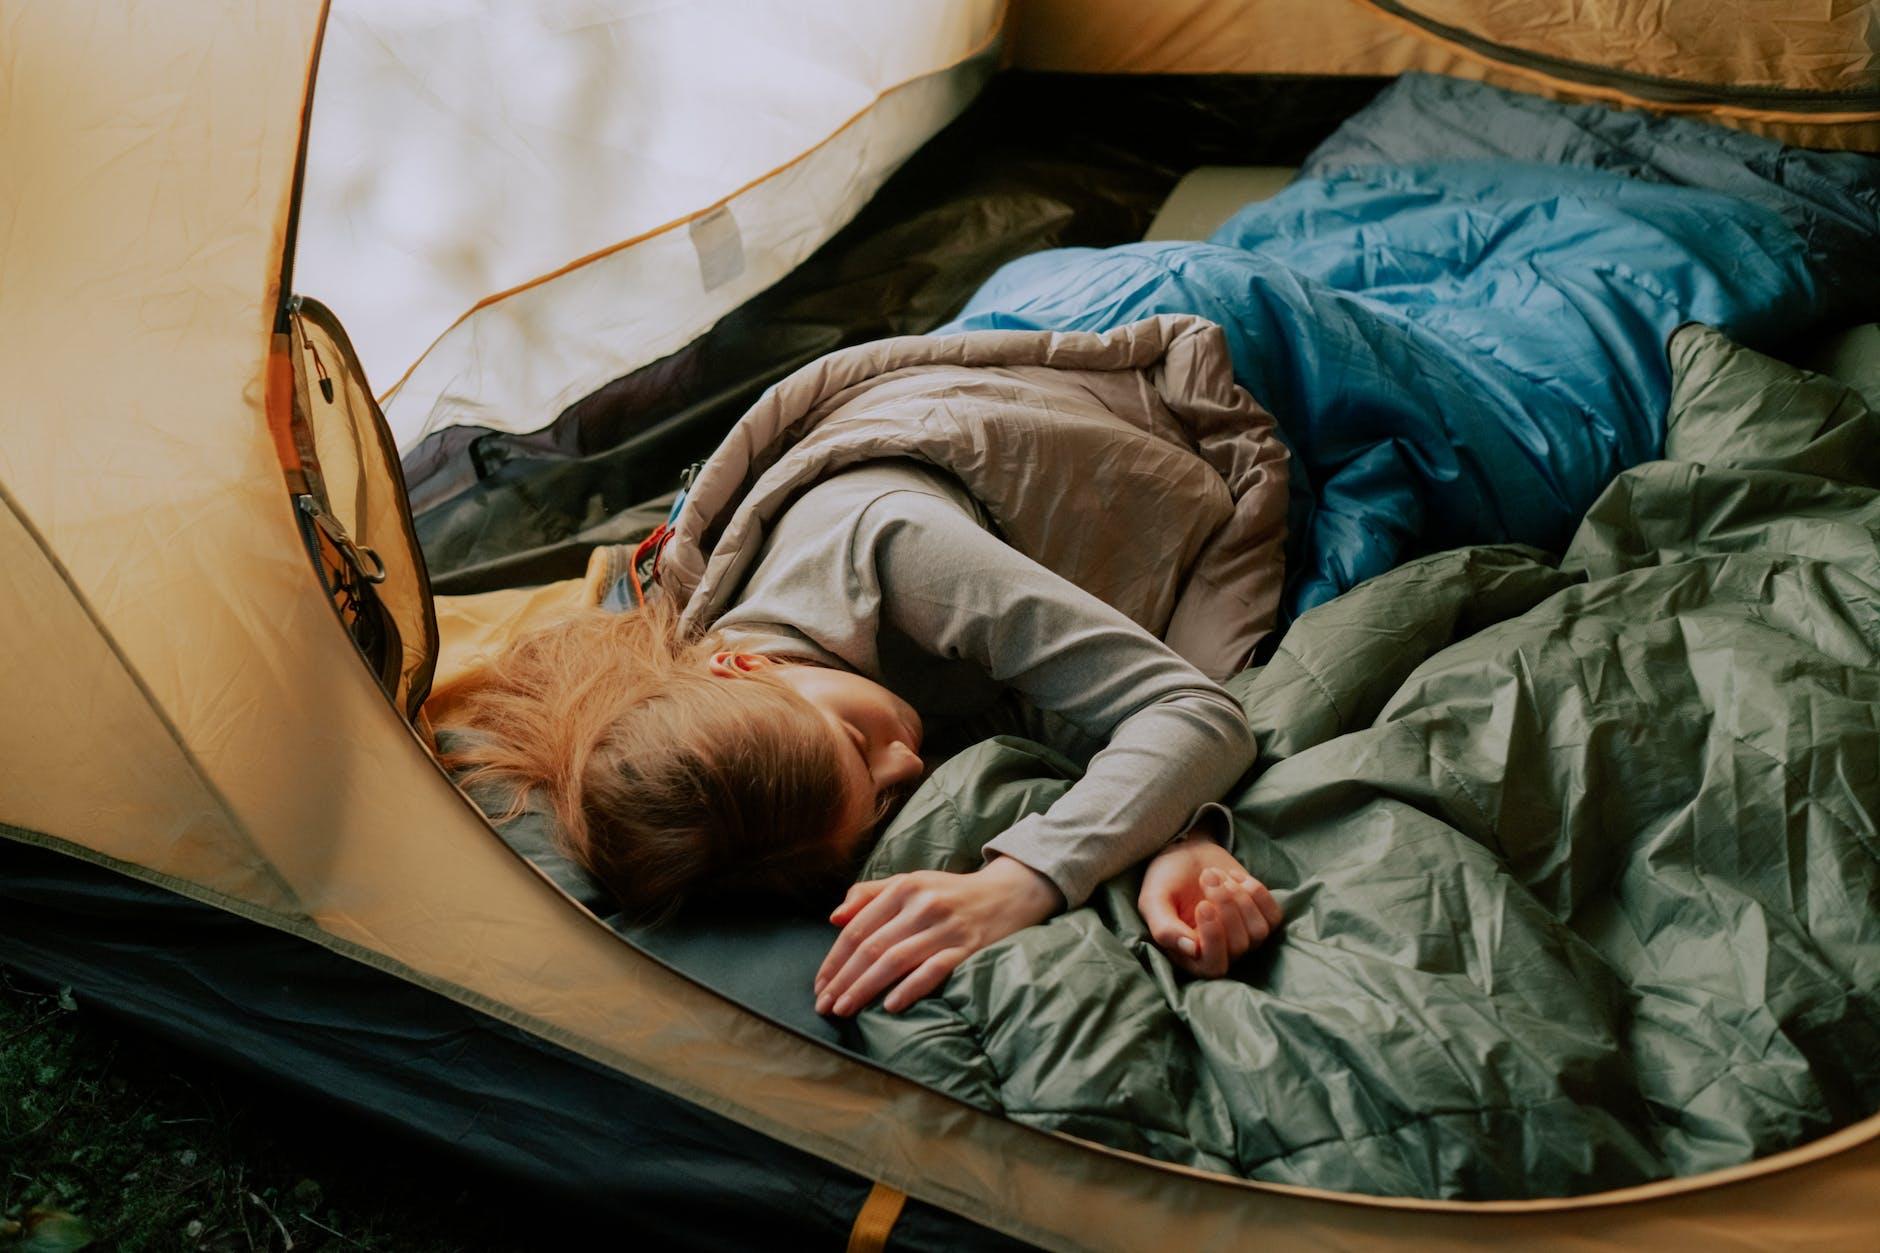 woman sleeping in tent on sleeping pad